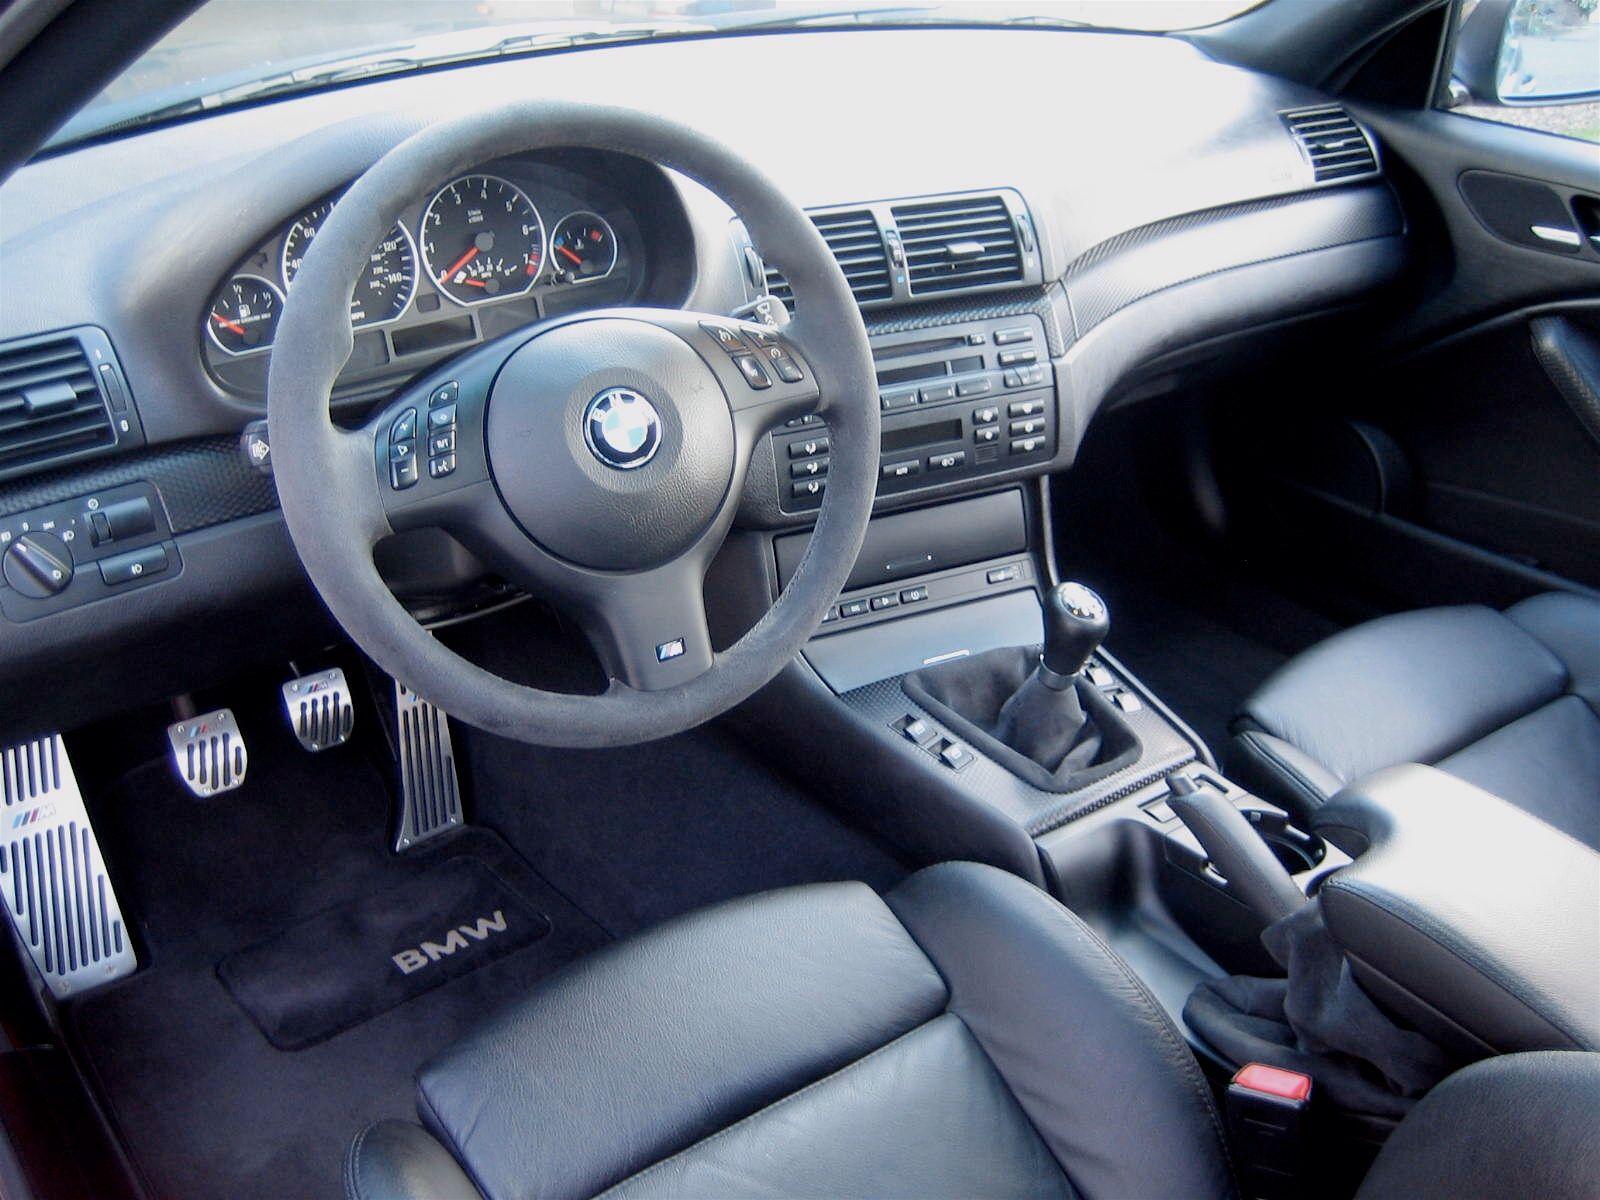 2005 E46 Bmw 330ci Zhp Interior 2005 E46 Bmw 330ci Zhp With